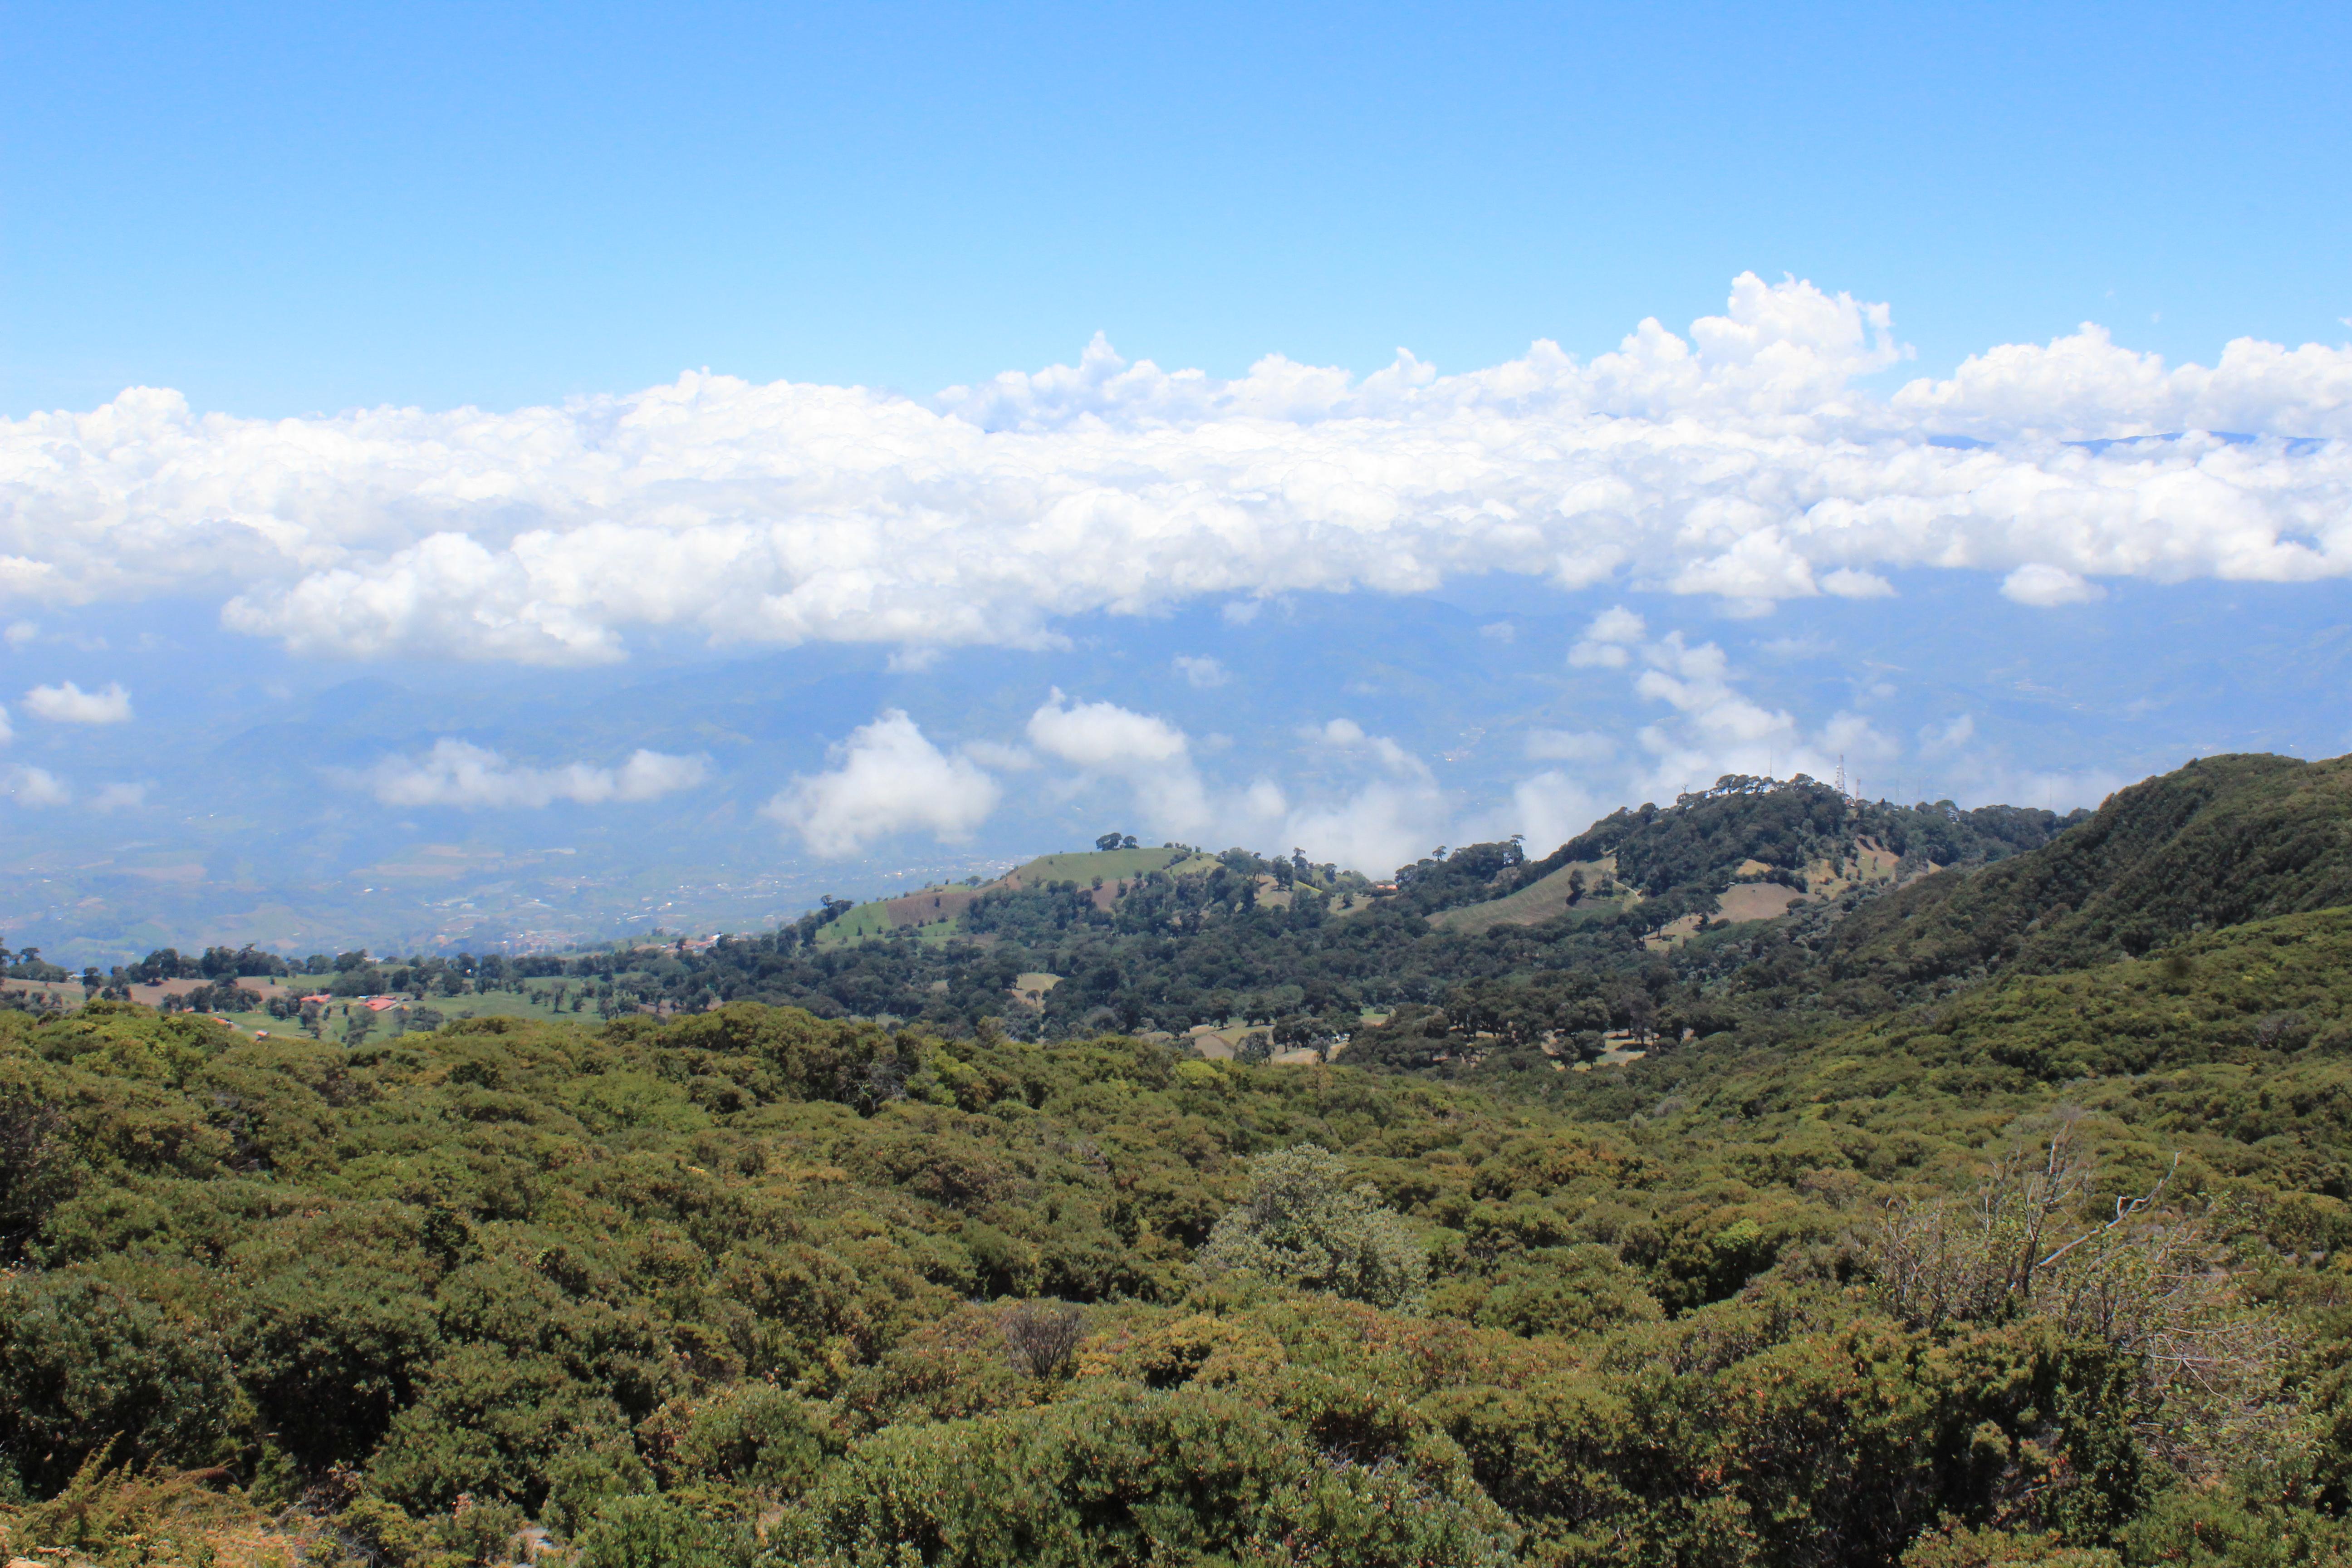 Klimawandel fördert Artenverlust in Tropenwäldern